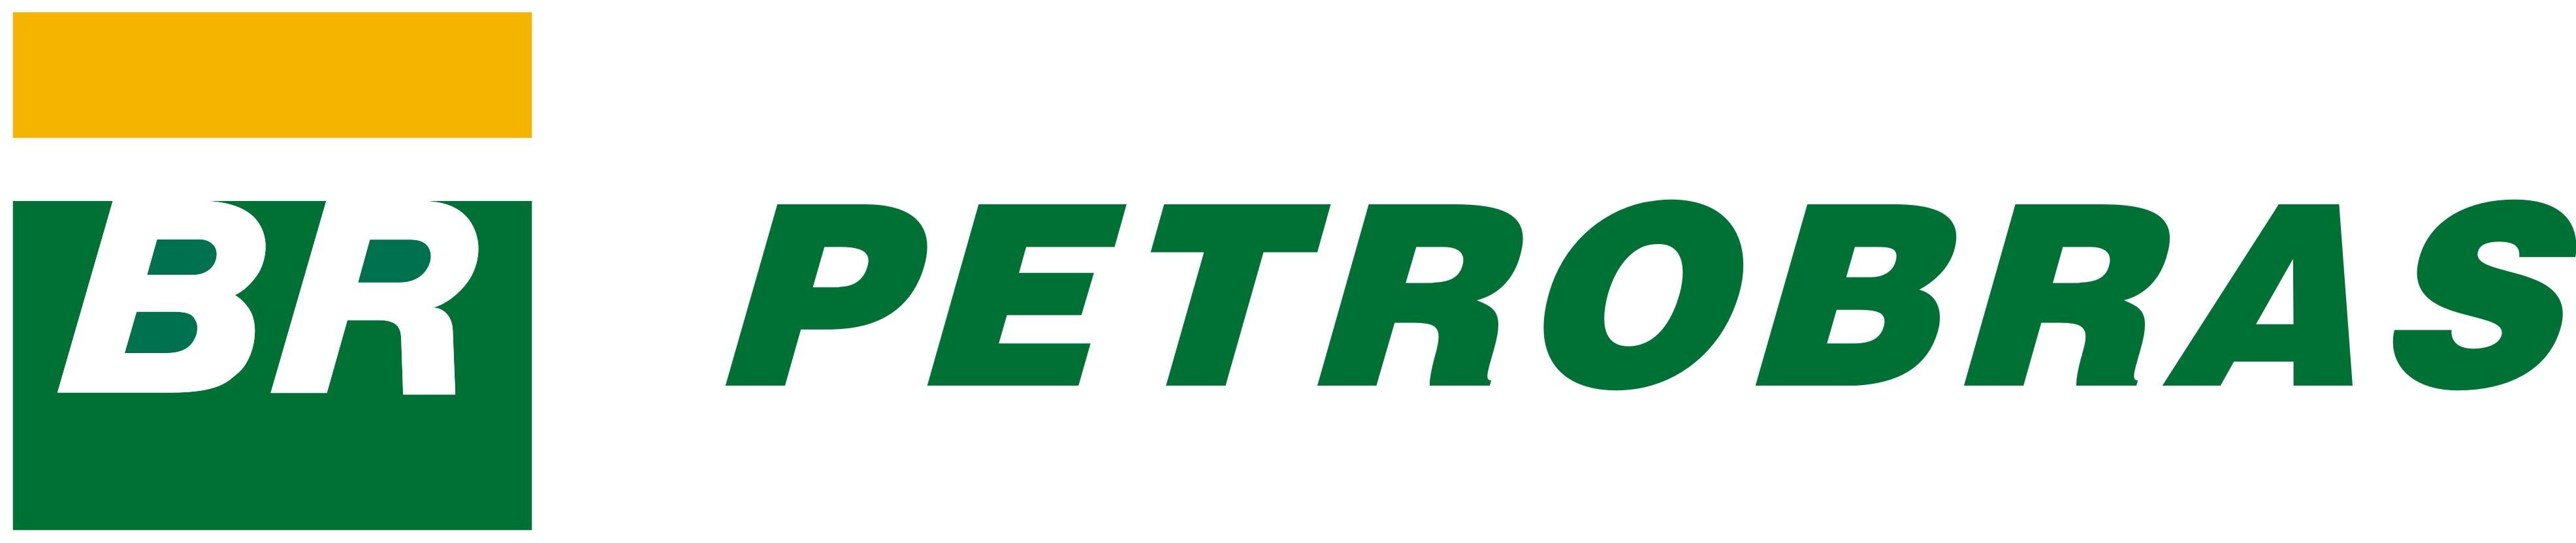 Logotipo de Petrobras Distribuidora